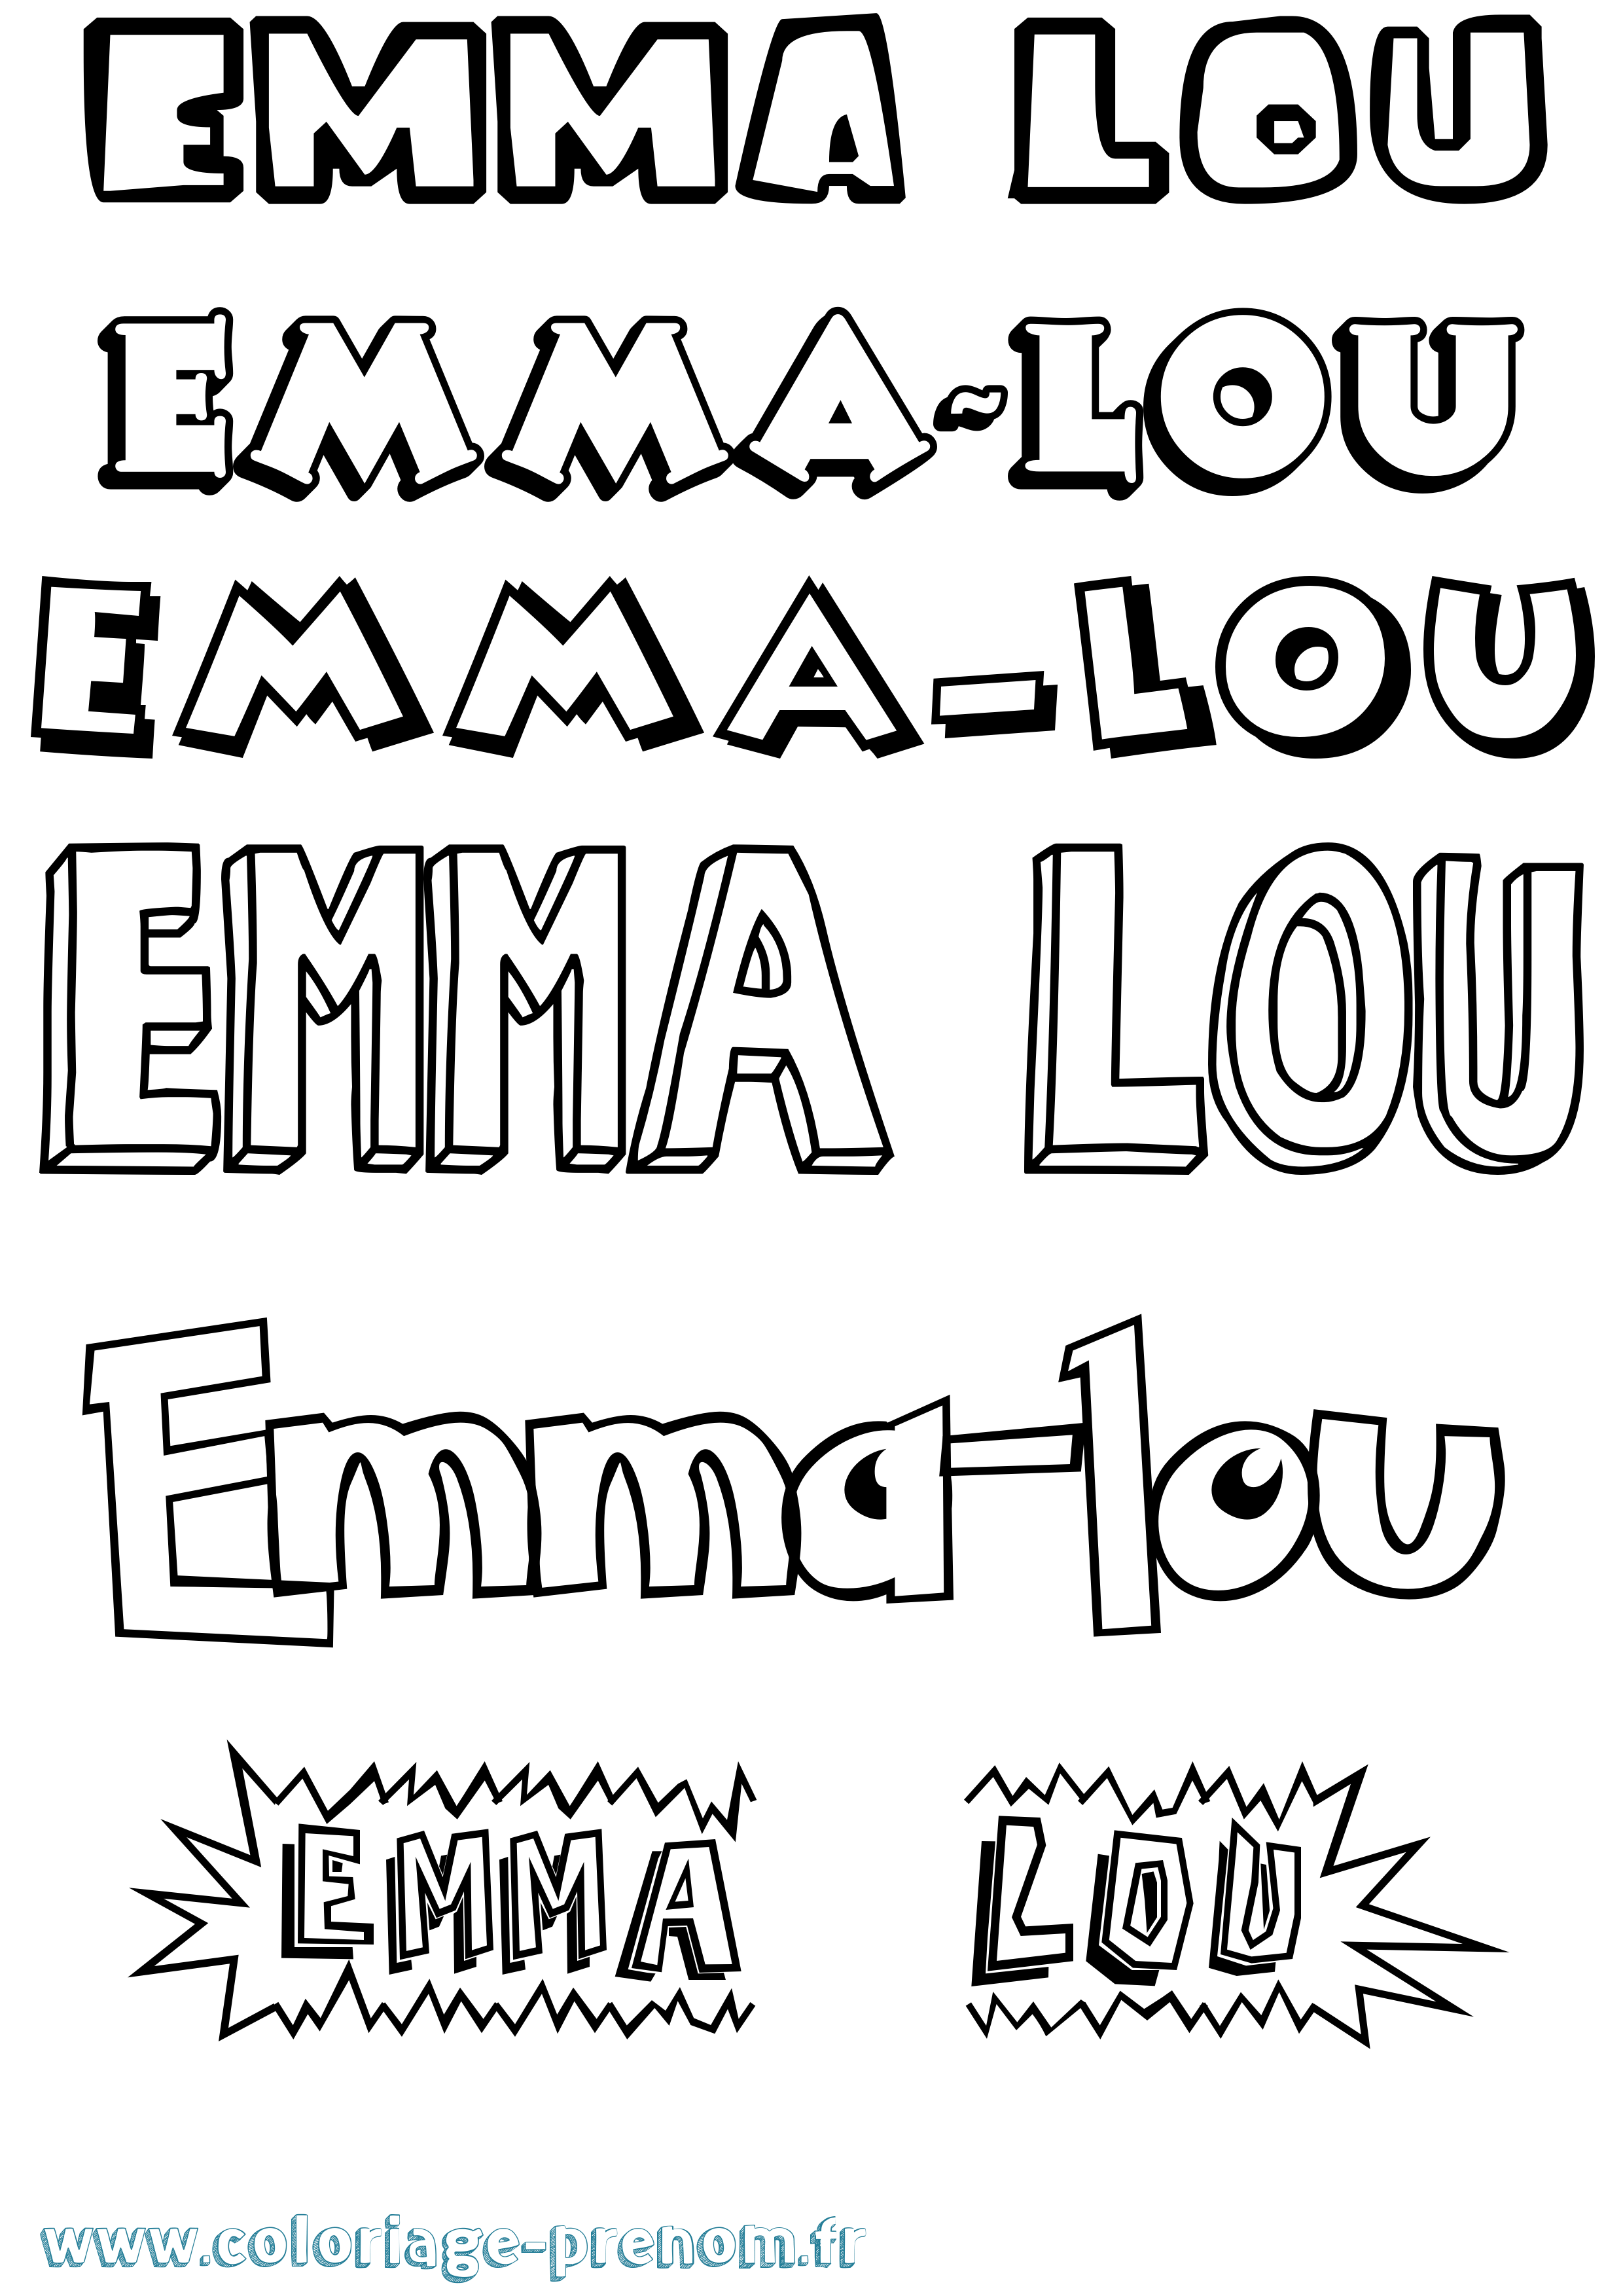 Le coloriage de lou le dessin anime de boomerang - Lou coloriage ...